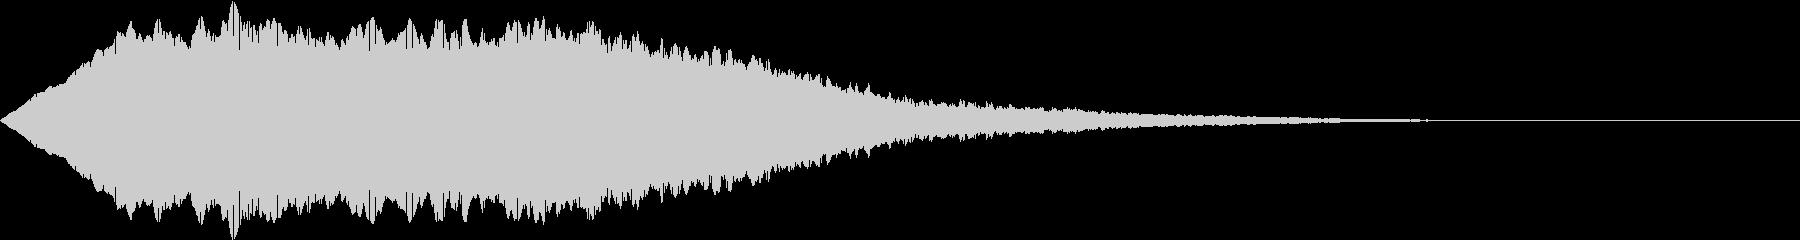 SFX ケミカルな昭和特撮風パッド 2の未再生の波形